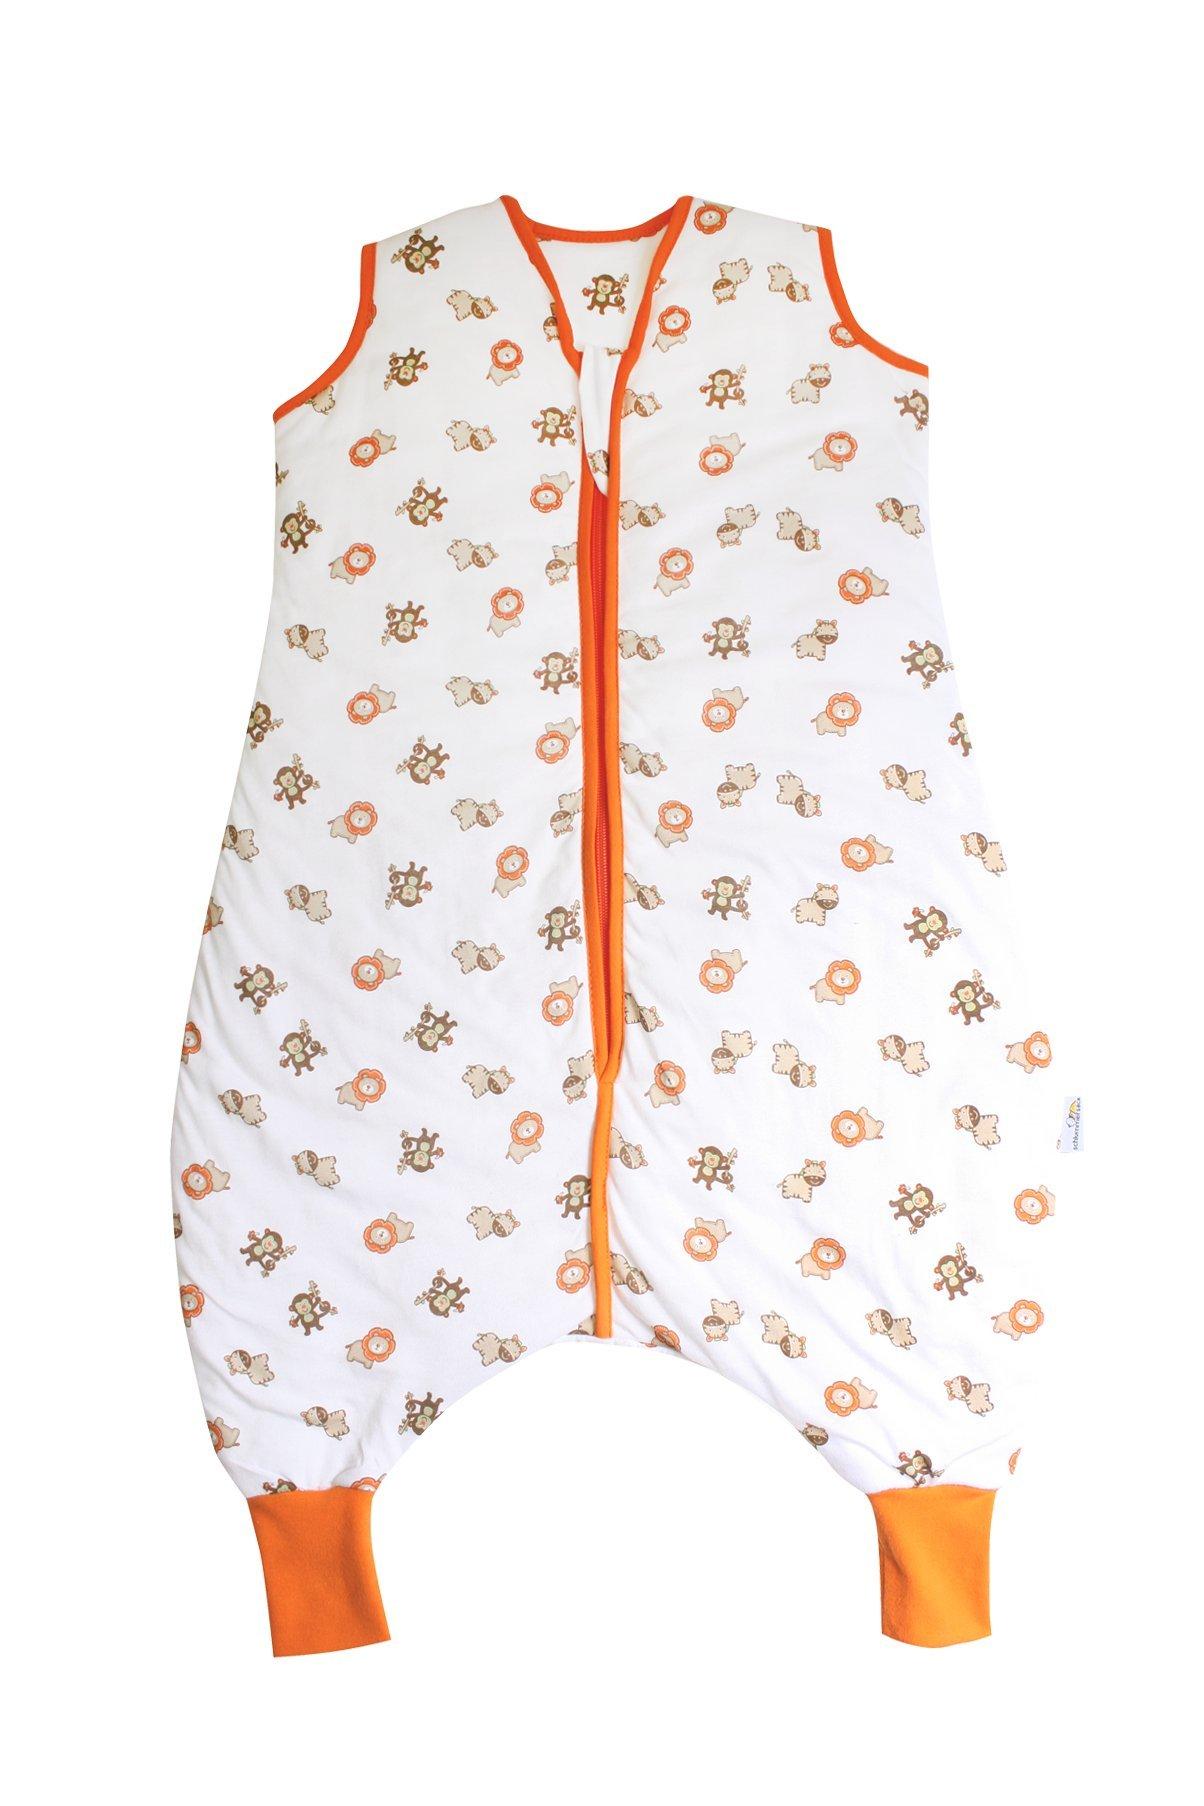 Slumbersafe Sleeping Bag With Feet 2.5 Tog Simply Teal Stars 24-36 months